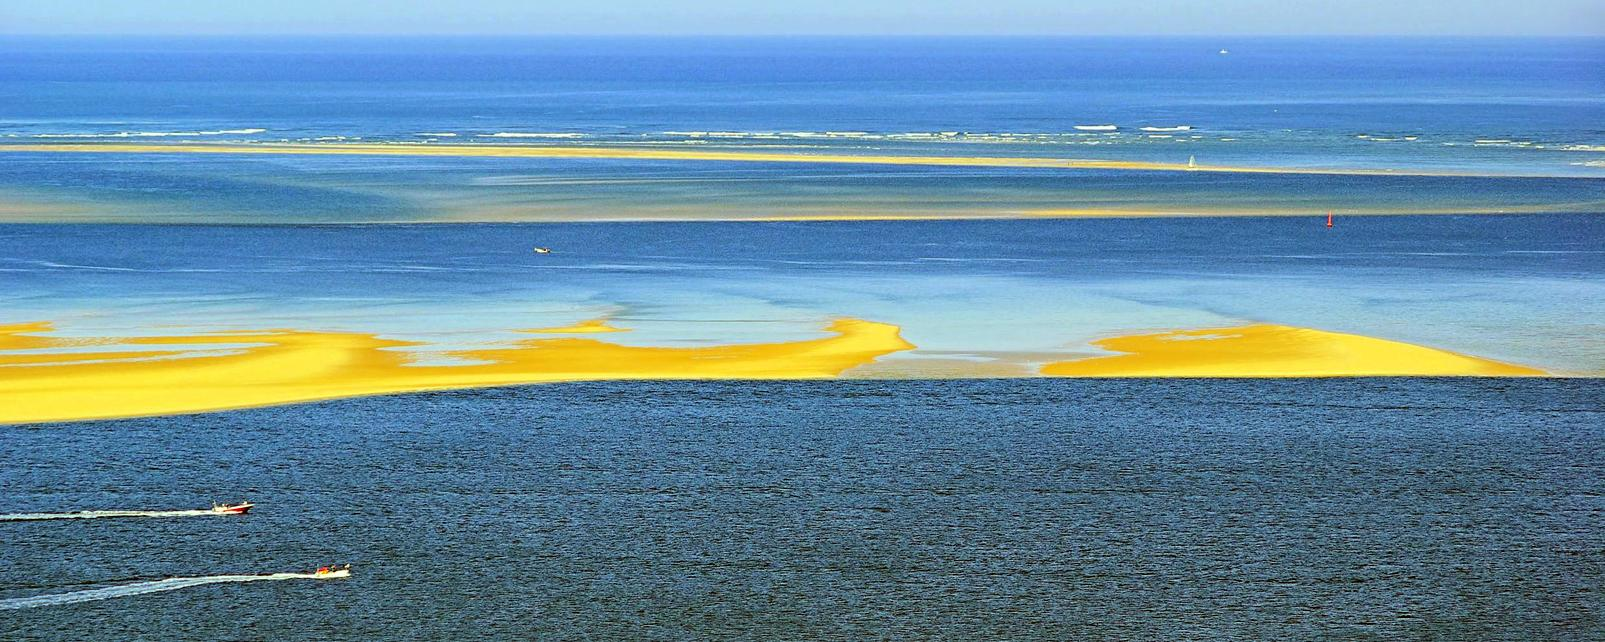 Europe, France, Aquitaine, Bassin, Arcachon, dune, Pyla, mer, océan, voilier, bateau,